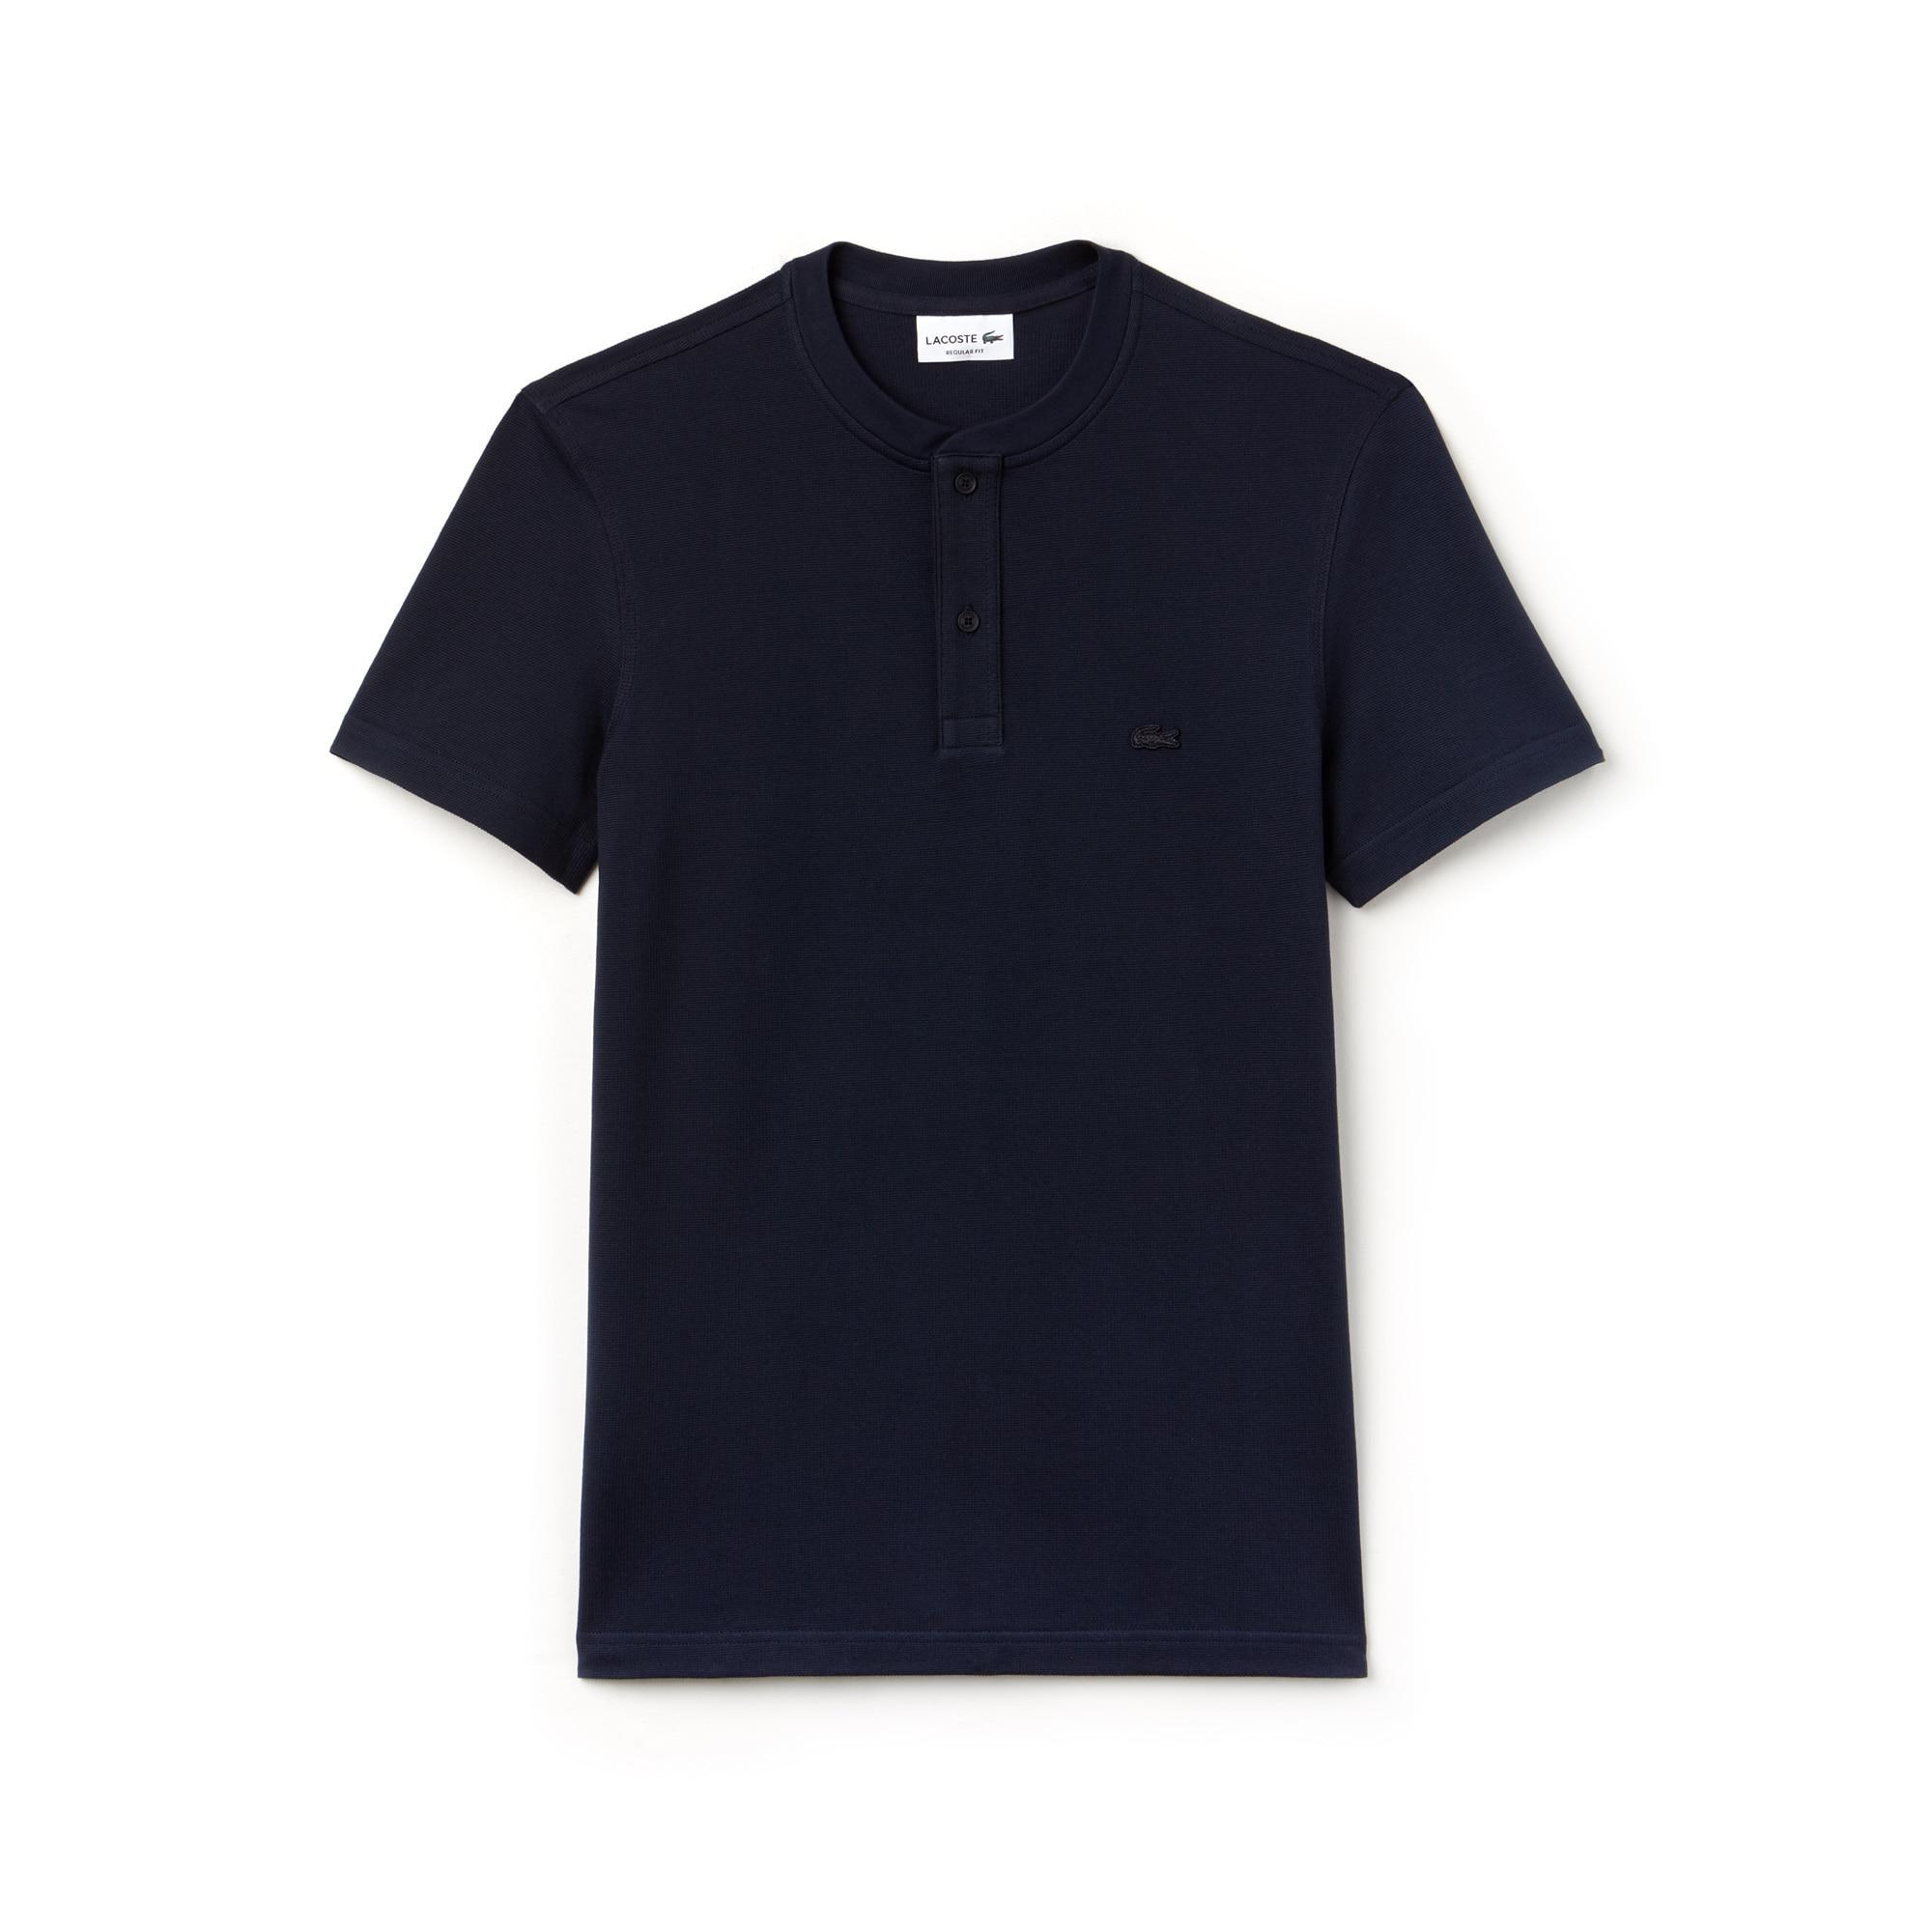 Men's Buttoned Contrast Knit T-Shirt